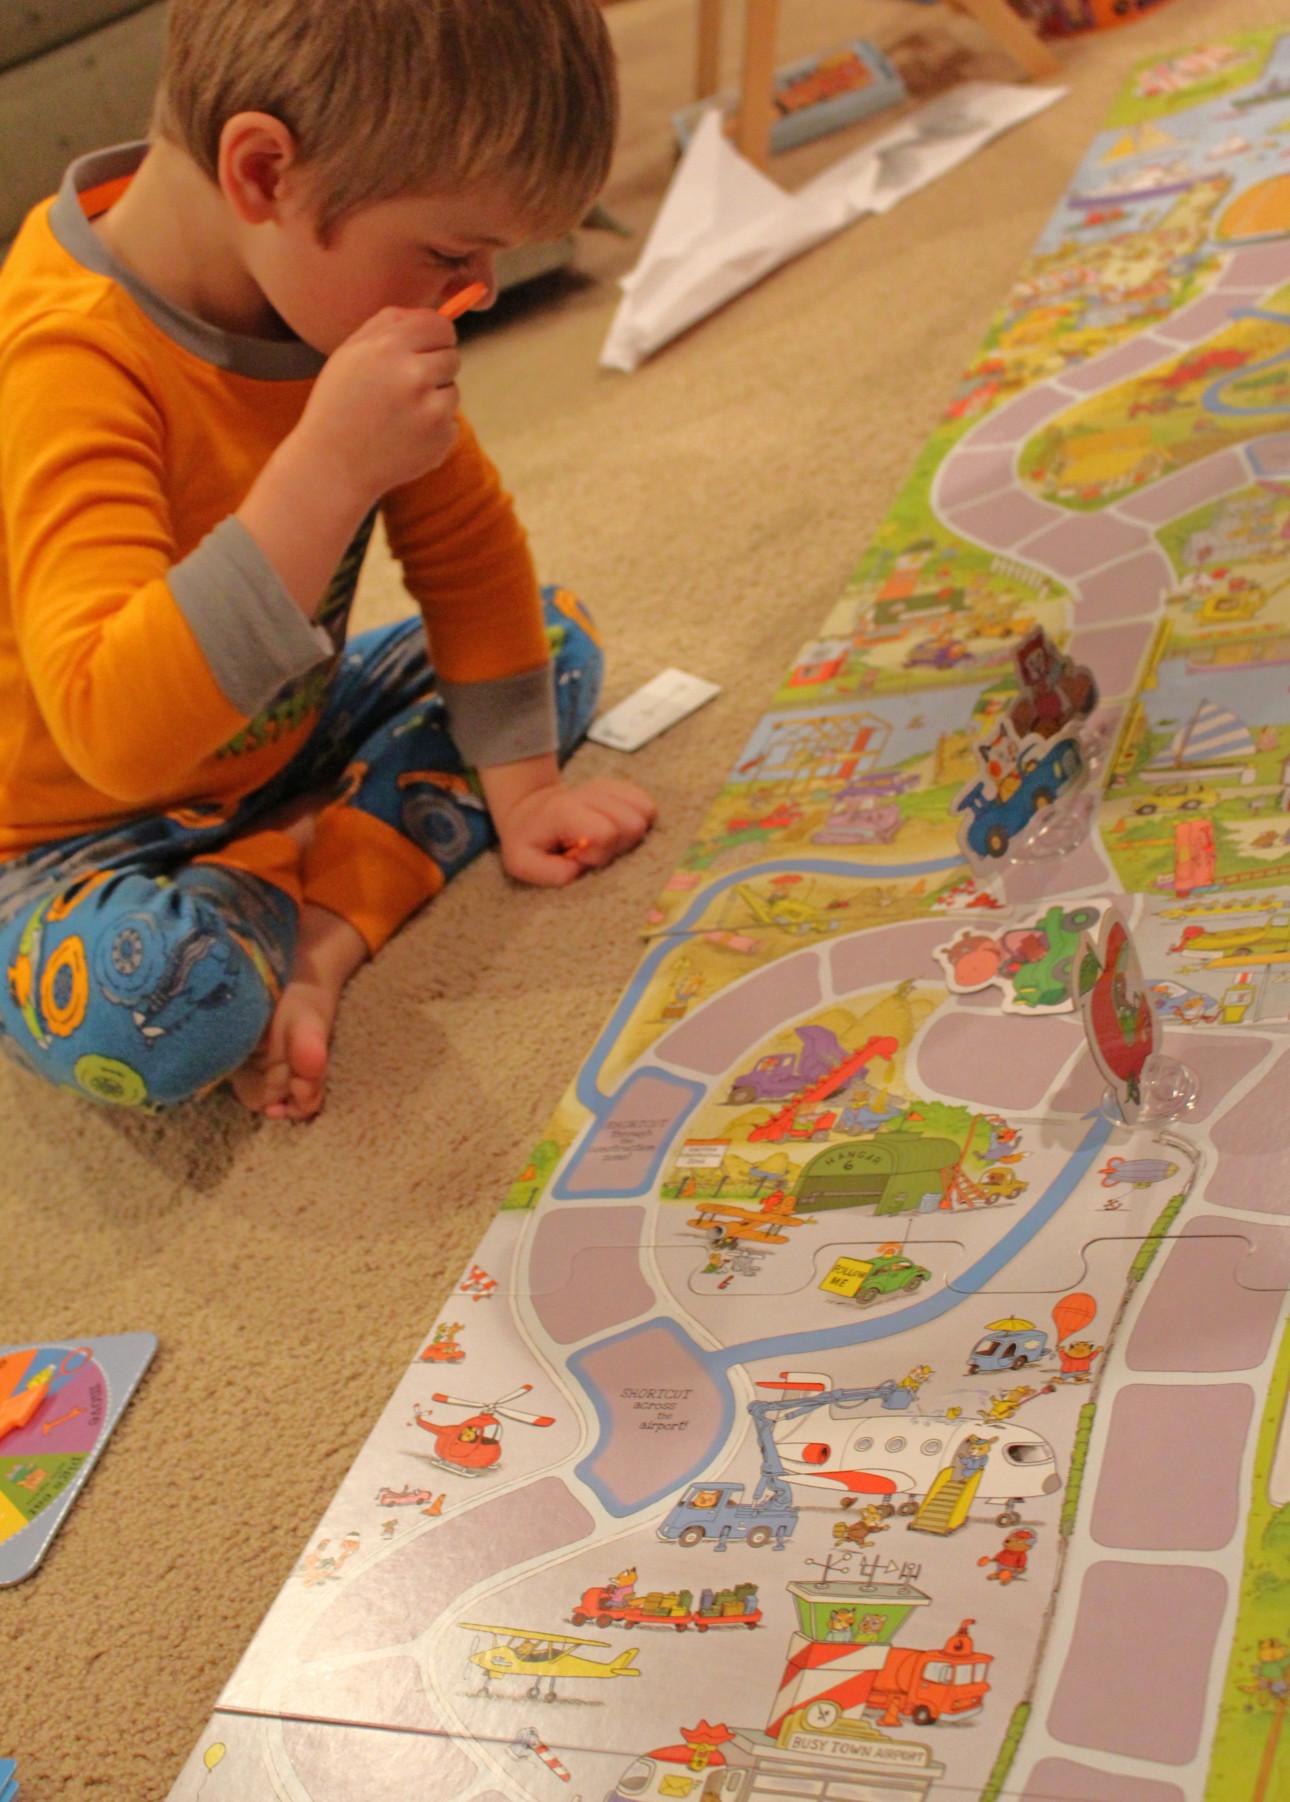 Best Board Games preschoolers busytown eye found it playing